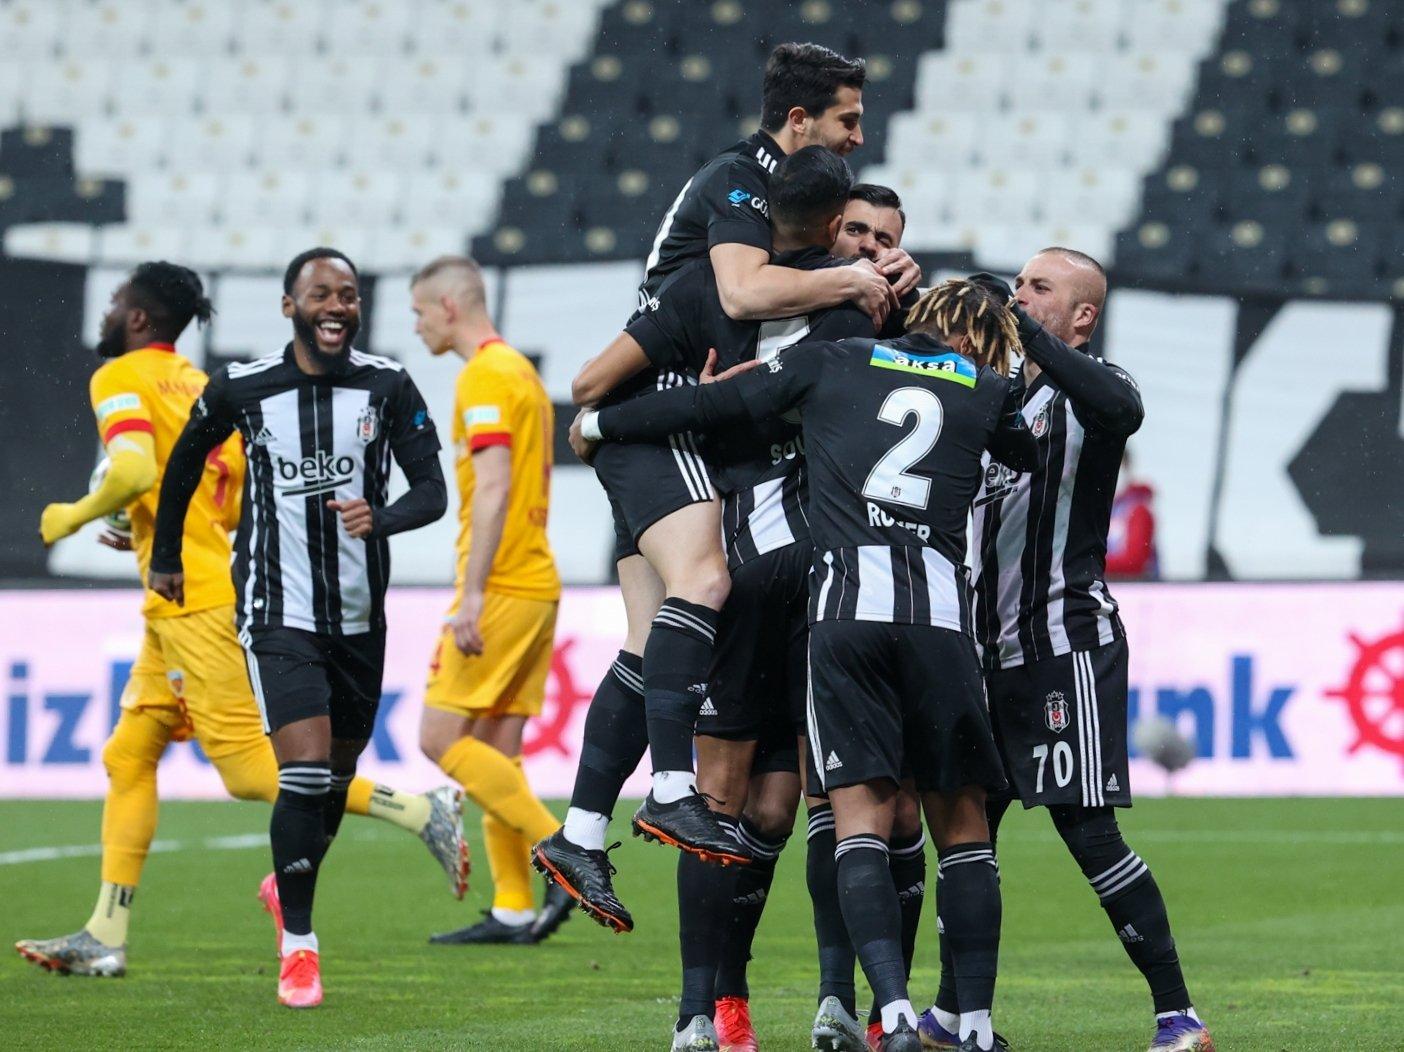 Beşiktaş players celebrate a goal during a Süper Lig match against Kayserispor at the Vodafone Park stadium in Istanbul, Turkey, April 24, 2021. (AA Photo)